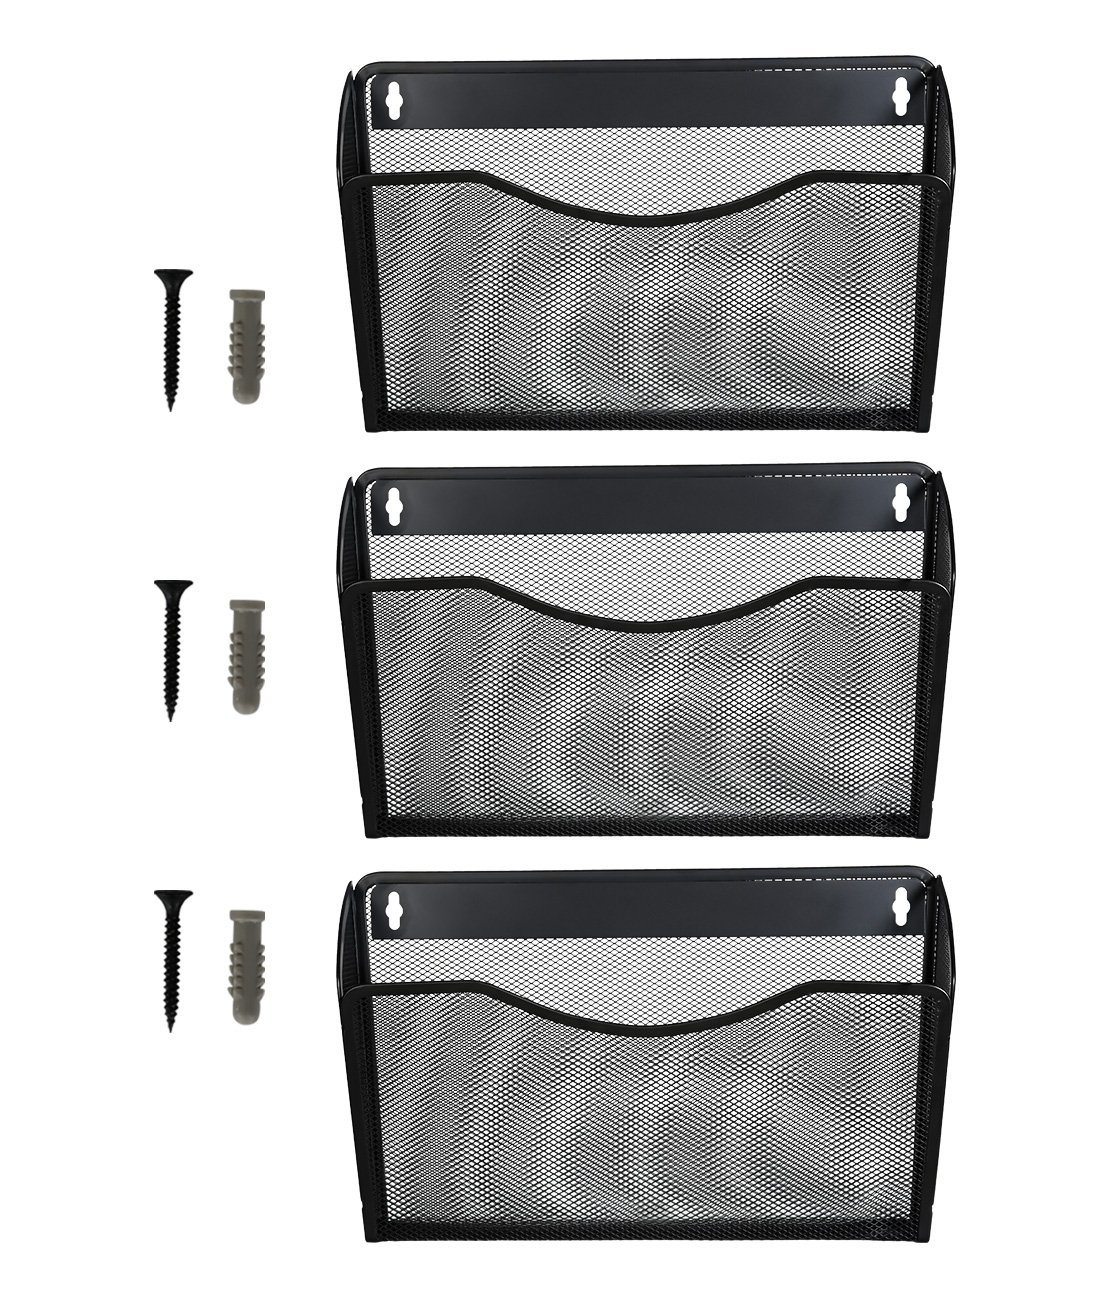 Superbpag 3 Pocket Hanging Wall File Holder Organizer Magazine Rack, Black York HSBG-3